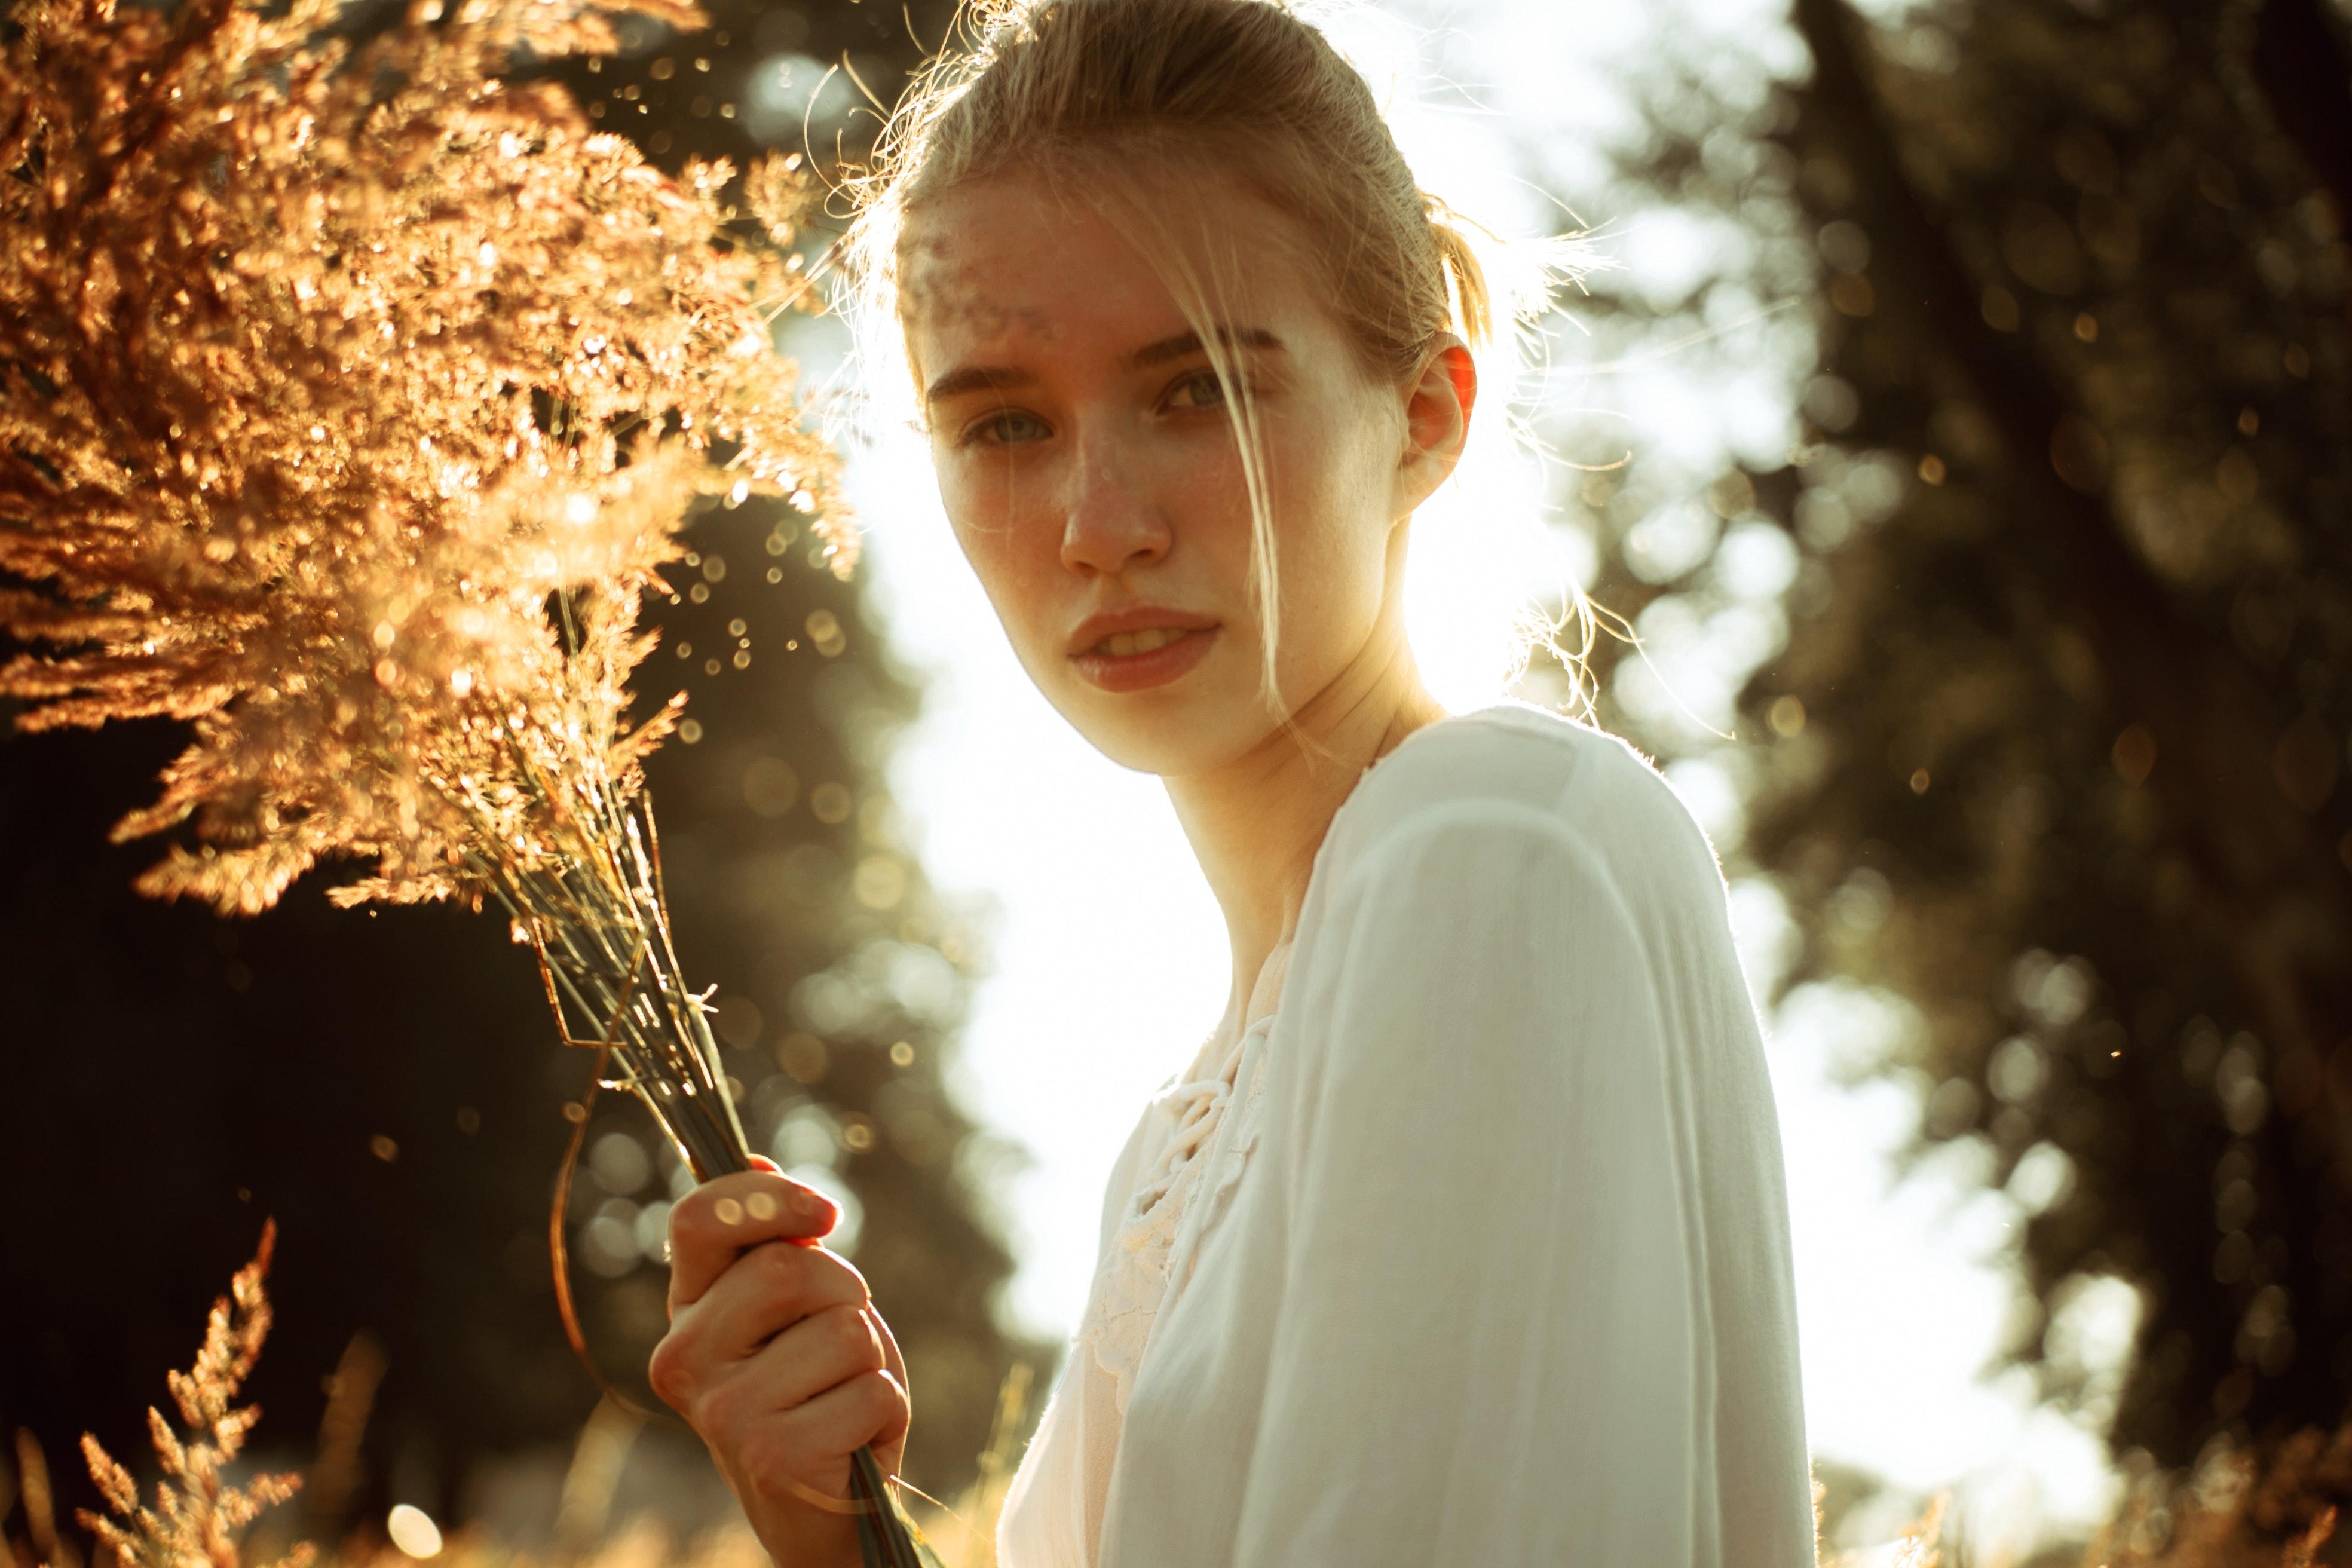 Здрава и блестяща: Как да се грижим за косата в сезона на косопада?